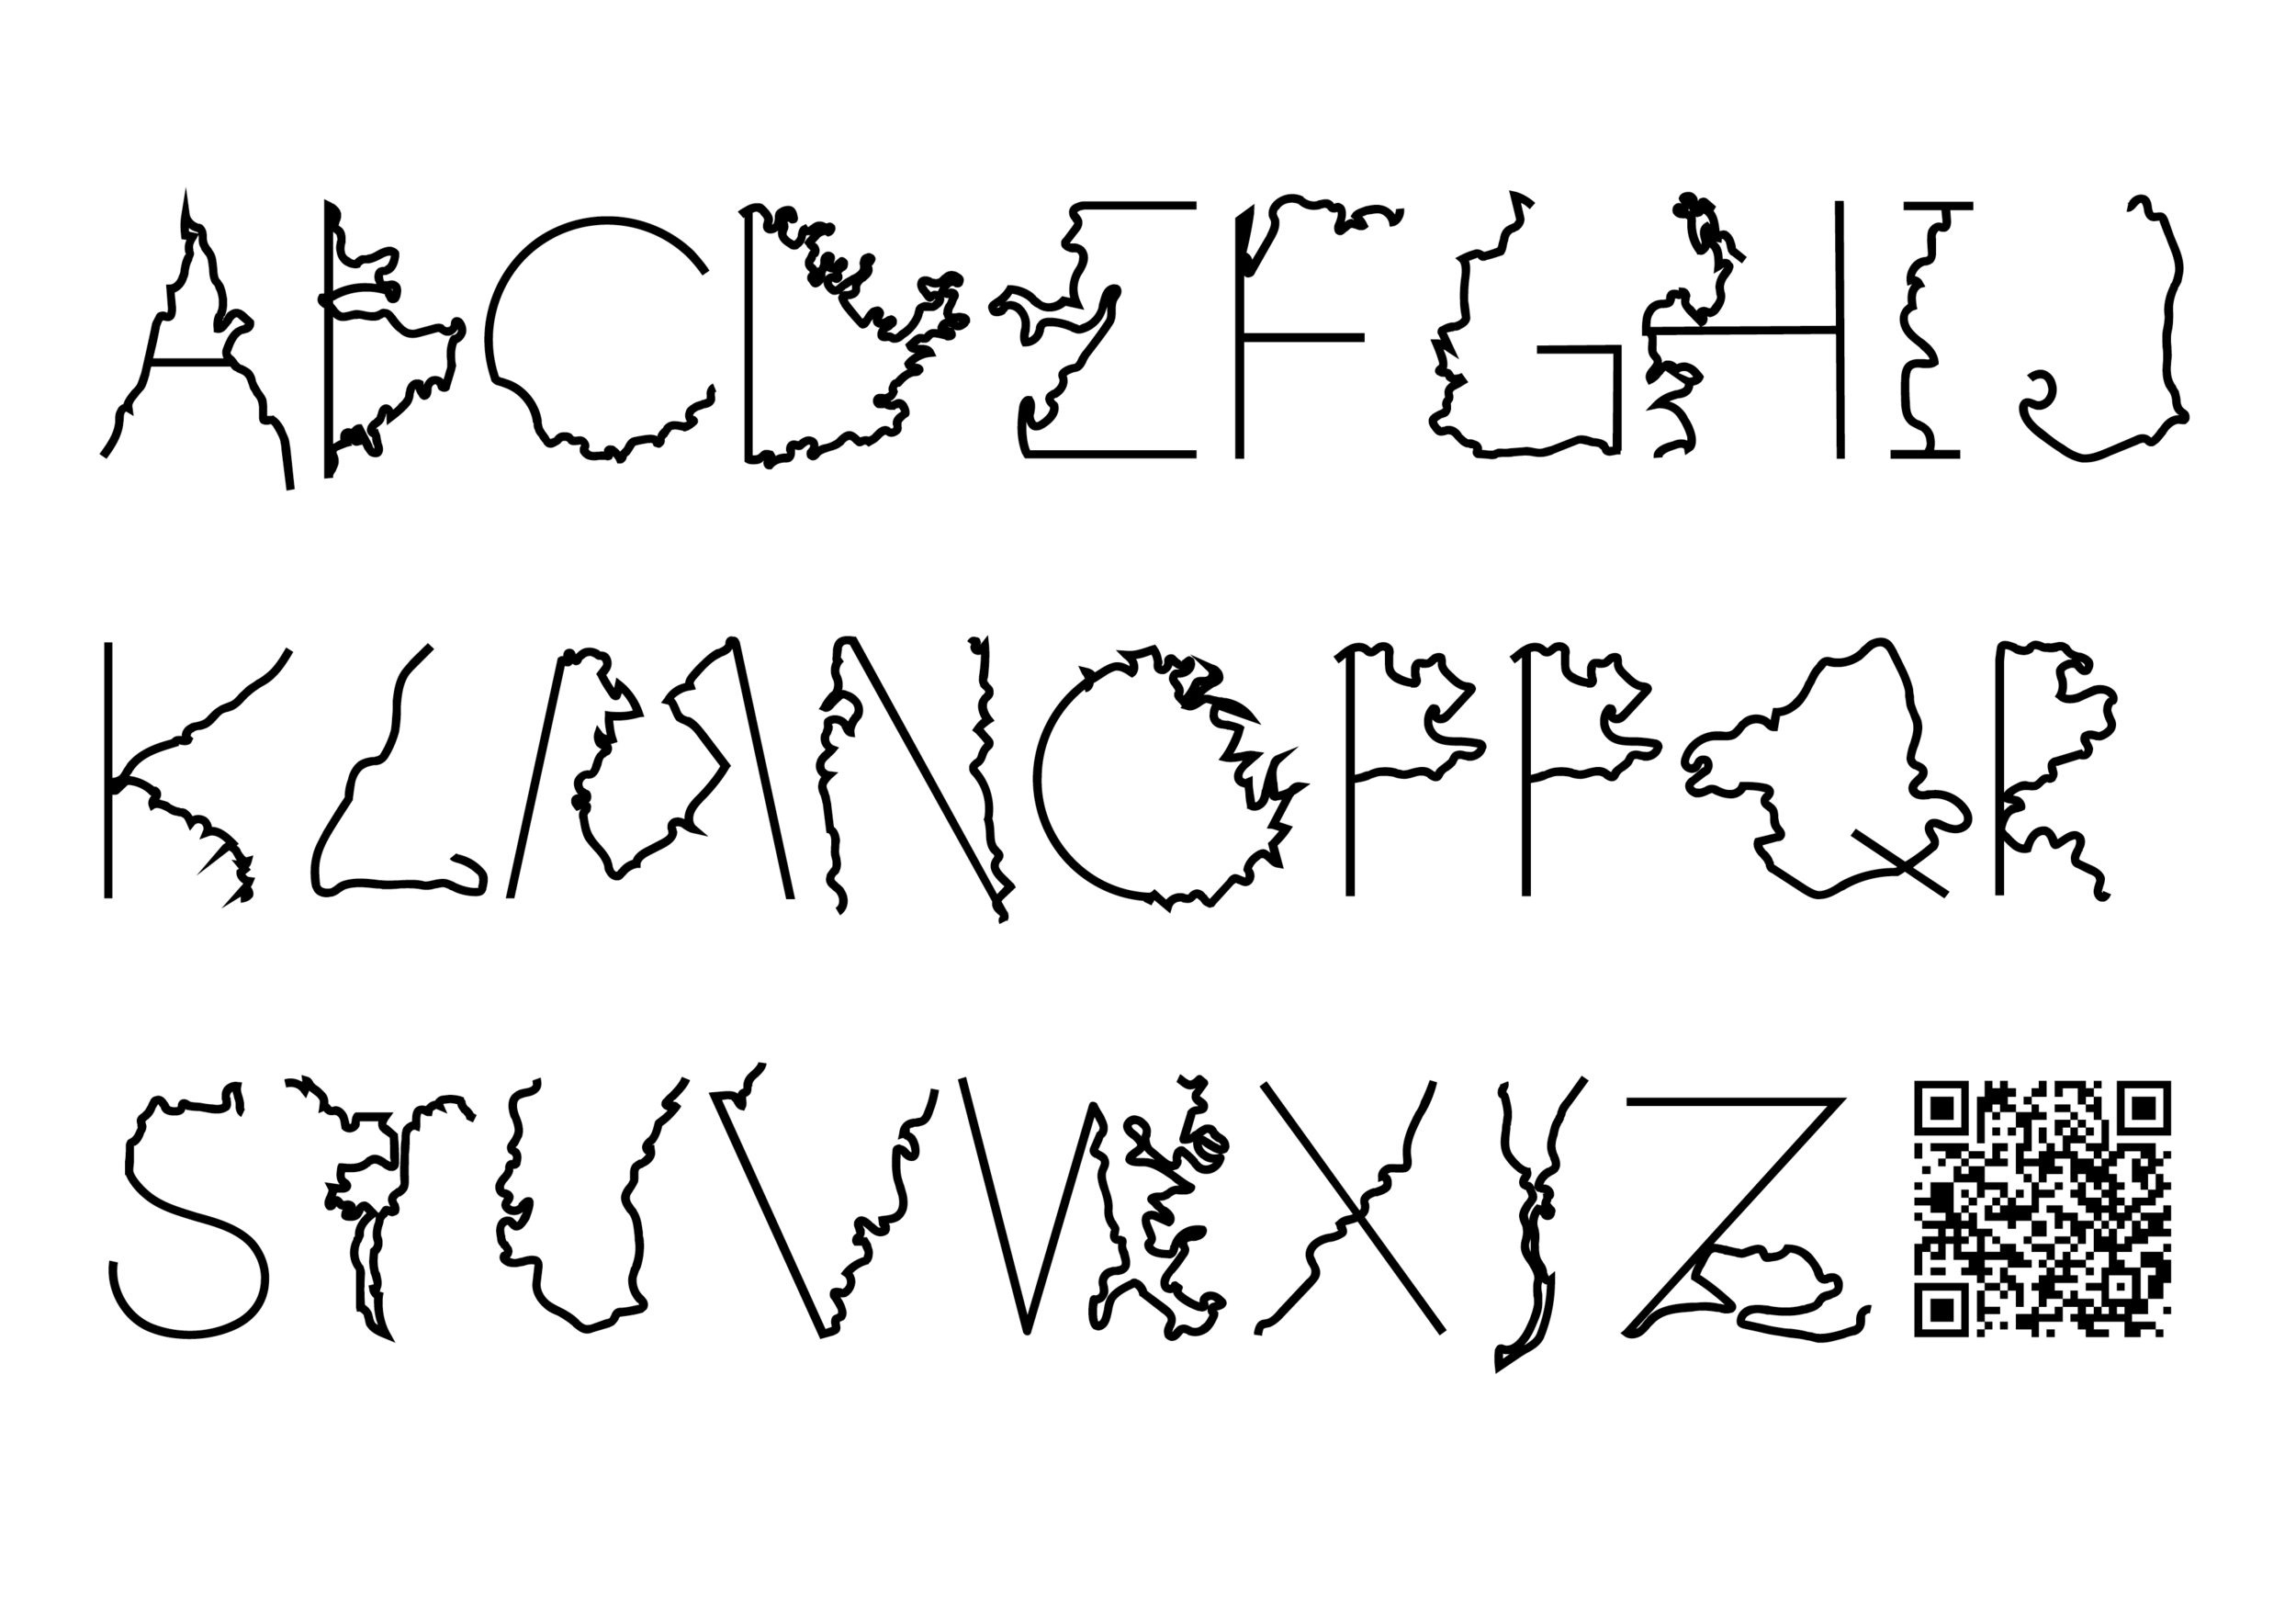 Johan Elmehag's Coastline typeface represents threatened coastal areas